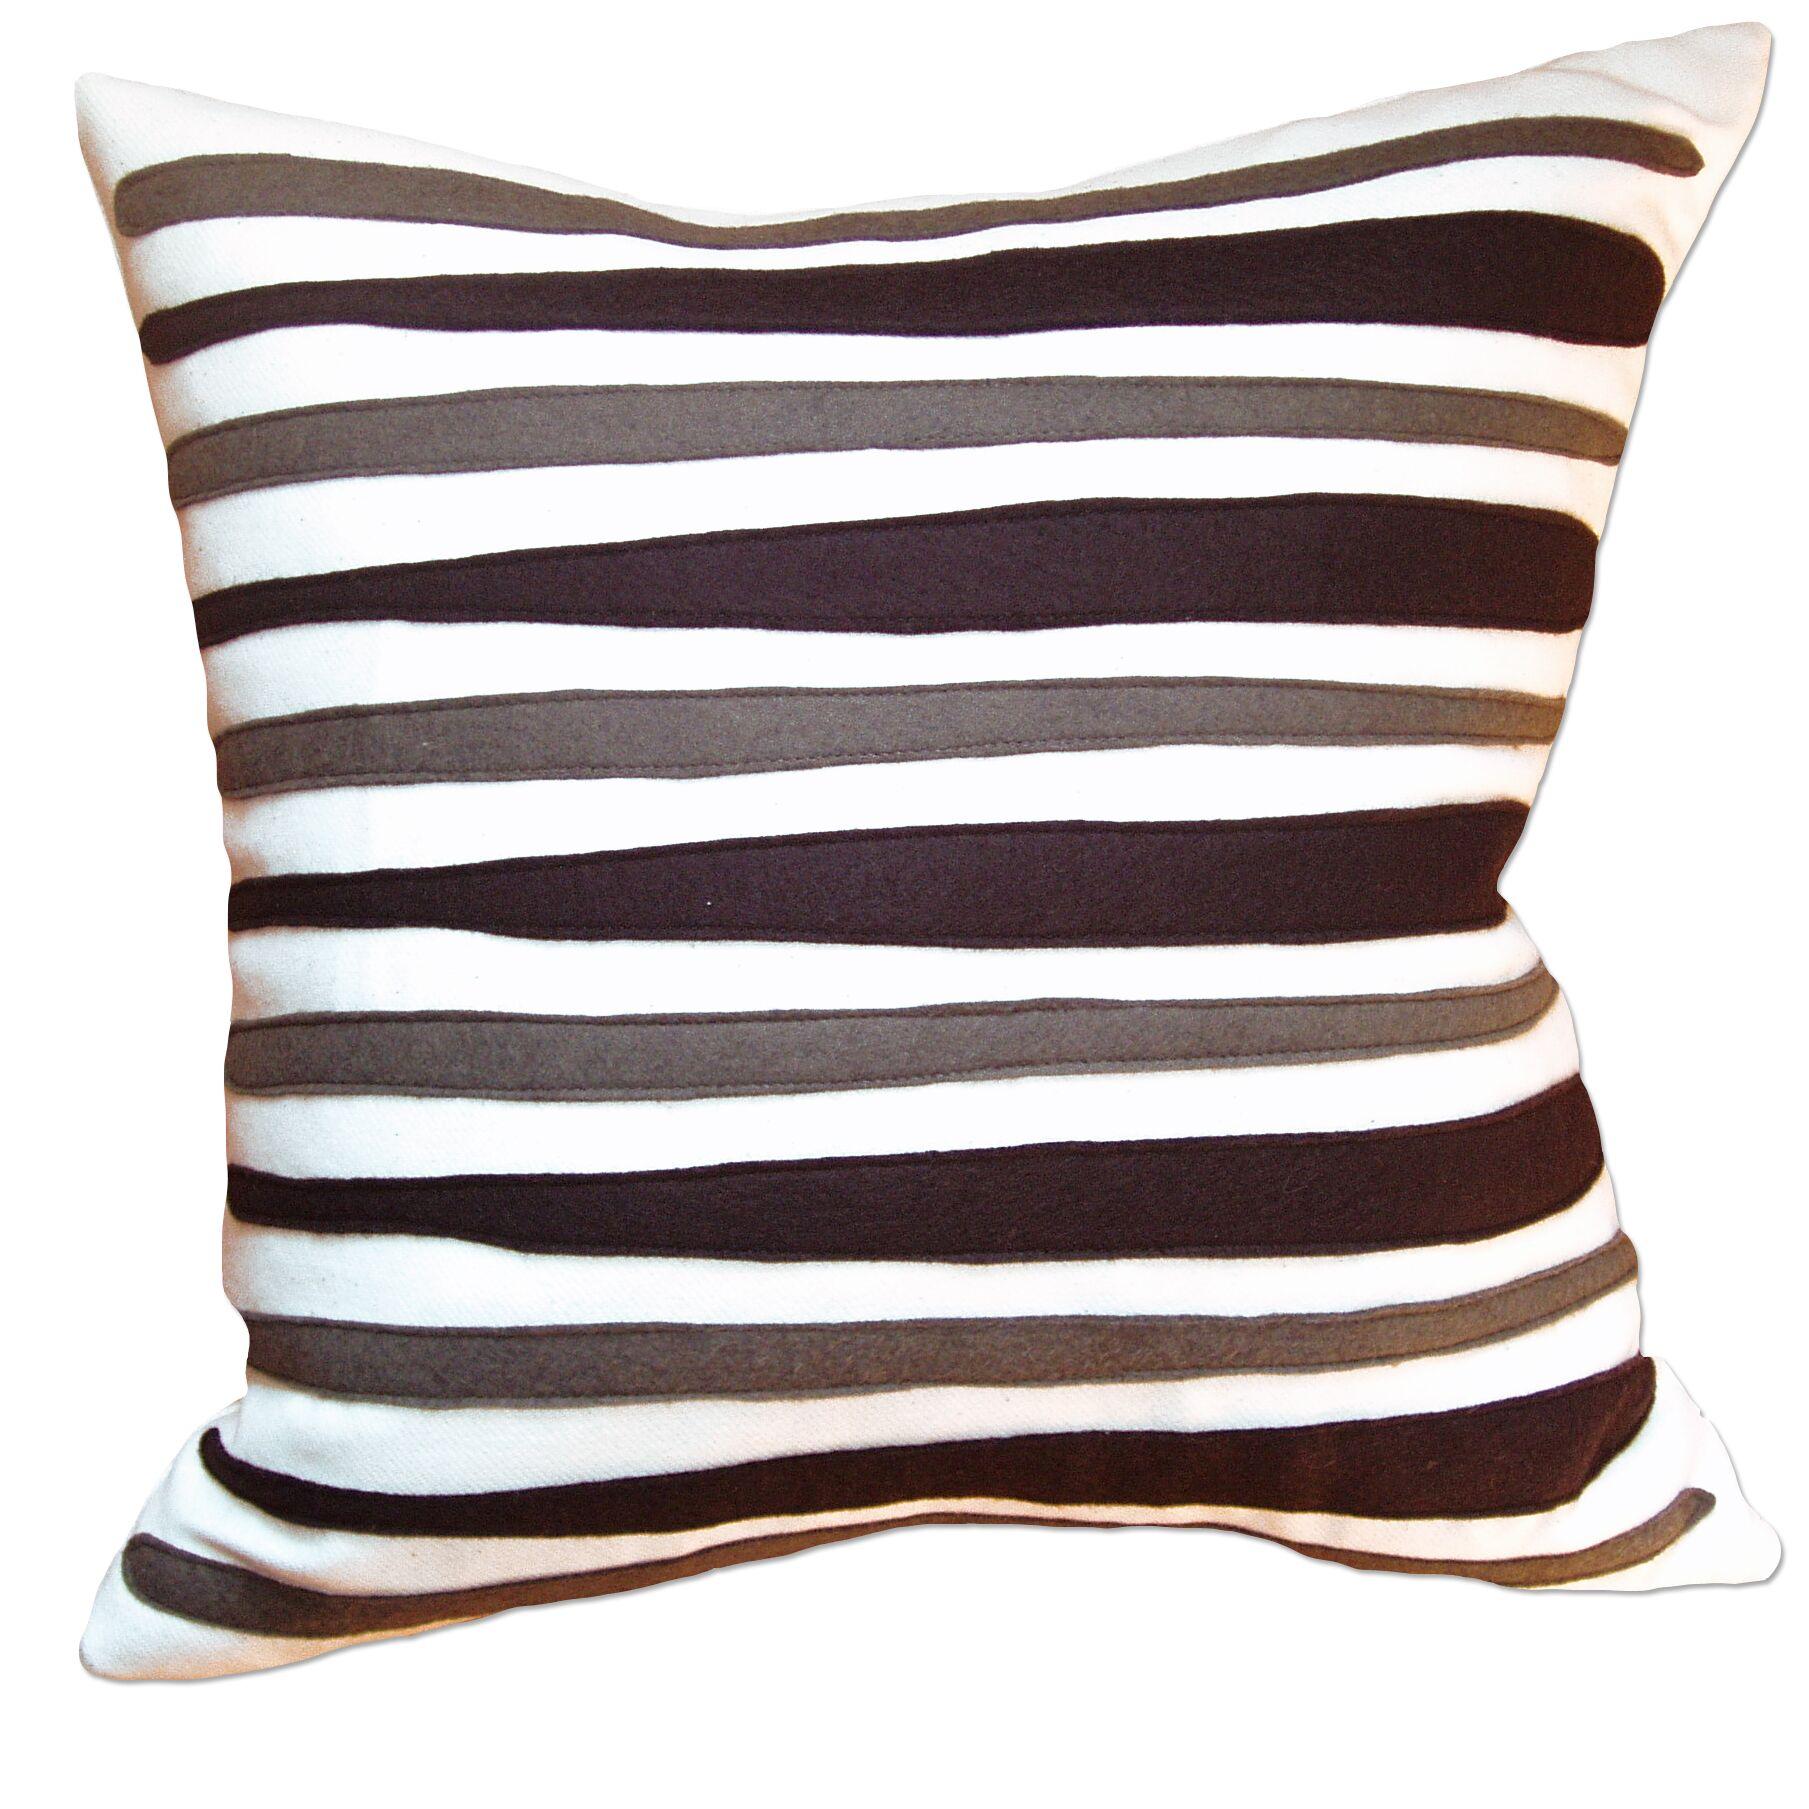 Moris Linen Throw Pillow Color: Oatmeal Linen Fabric in Navy/Leaf